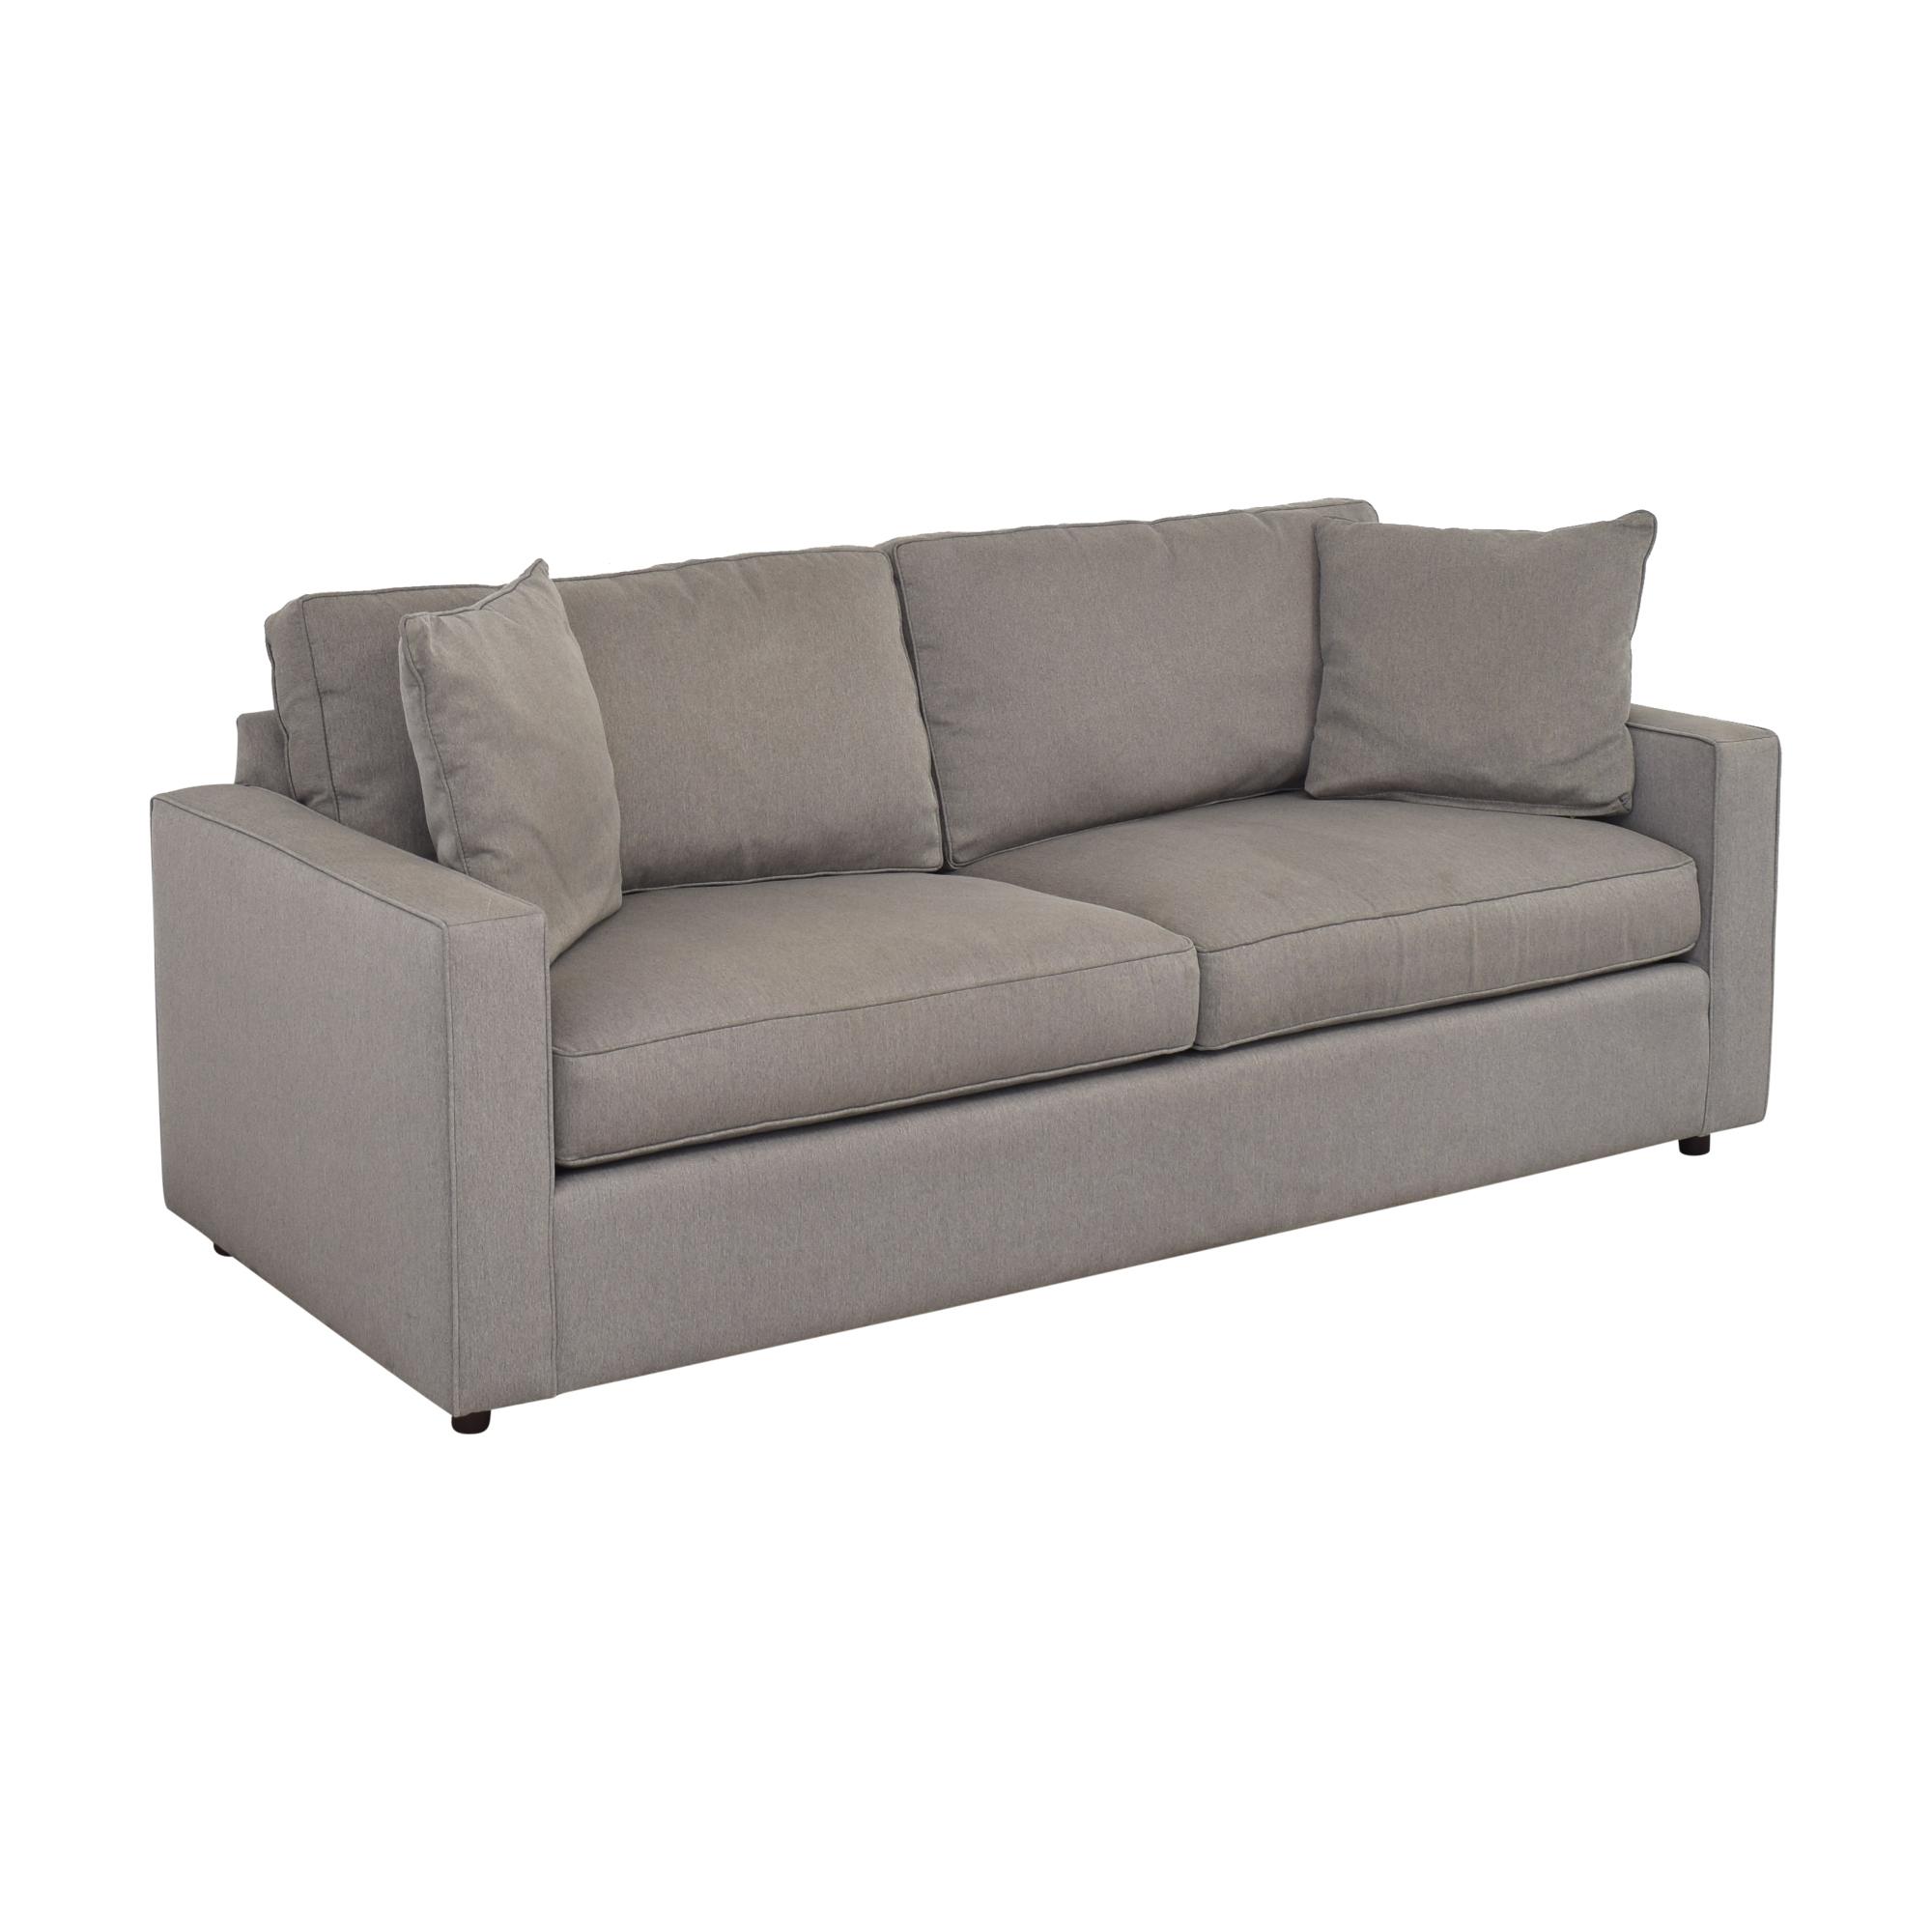 buy Room & Board York Two Cushion Sofa Room & Board Classic Sofas